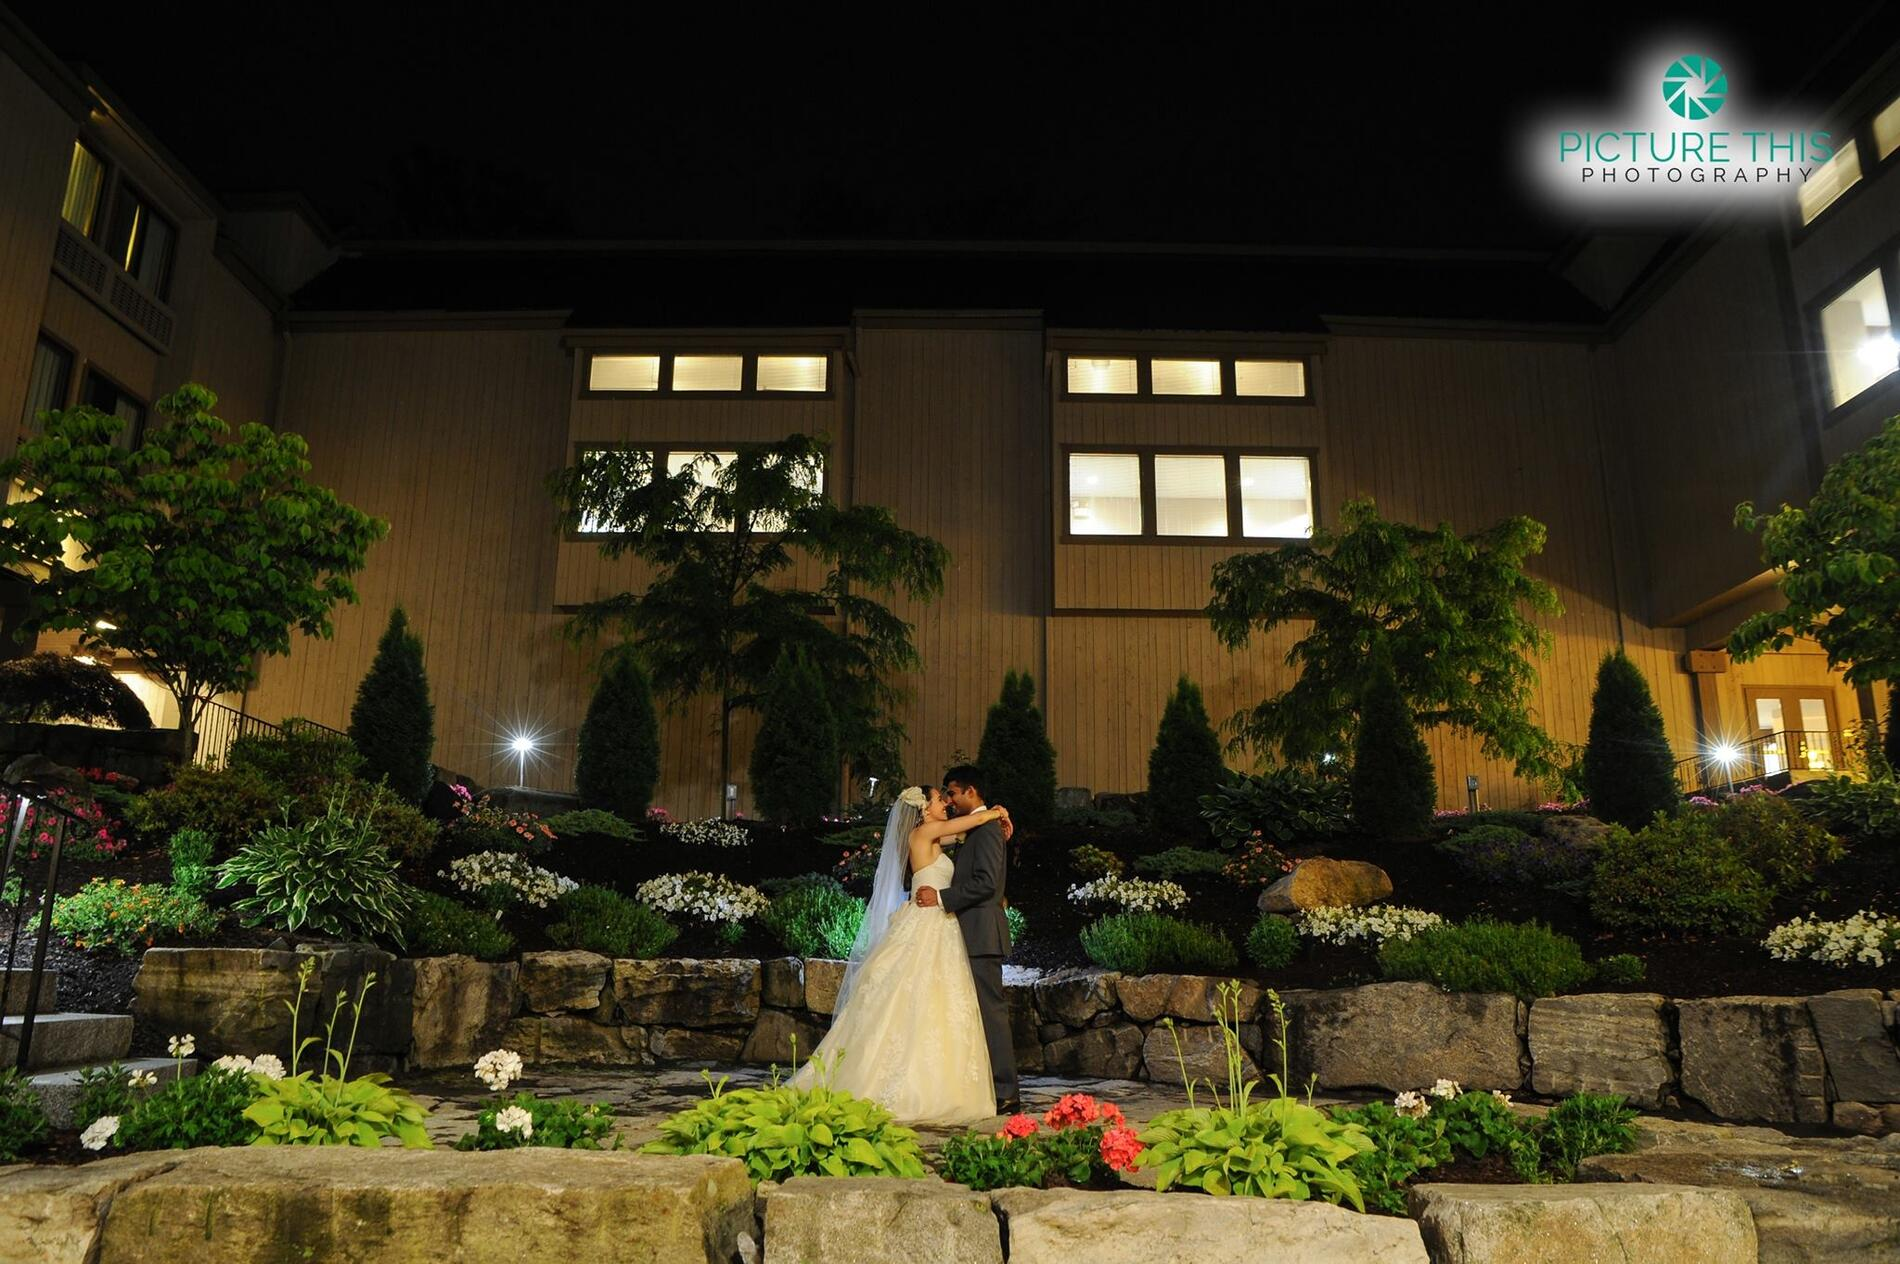 Wedding in a stone garden